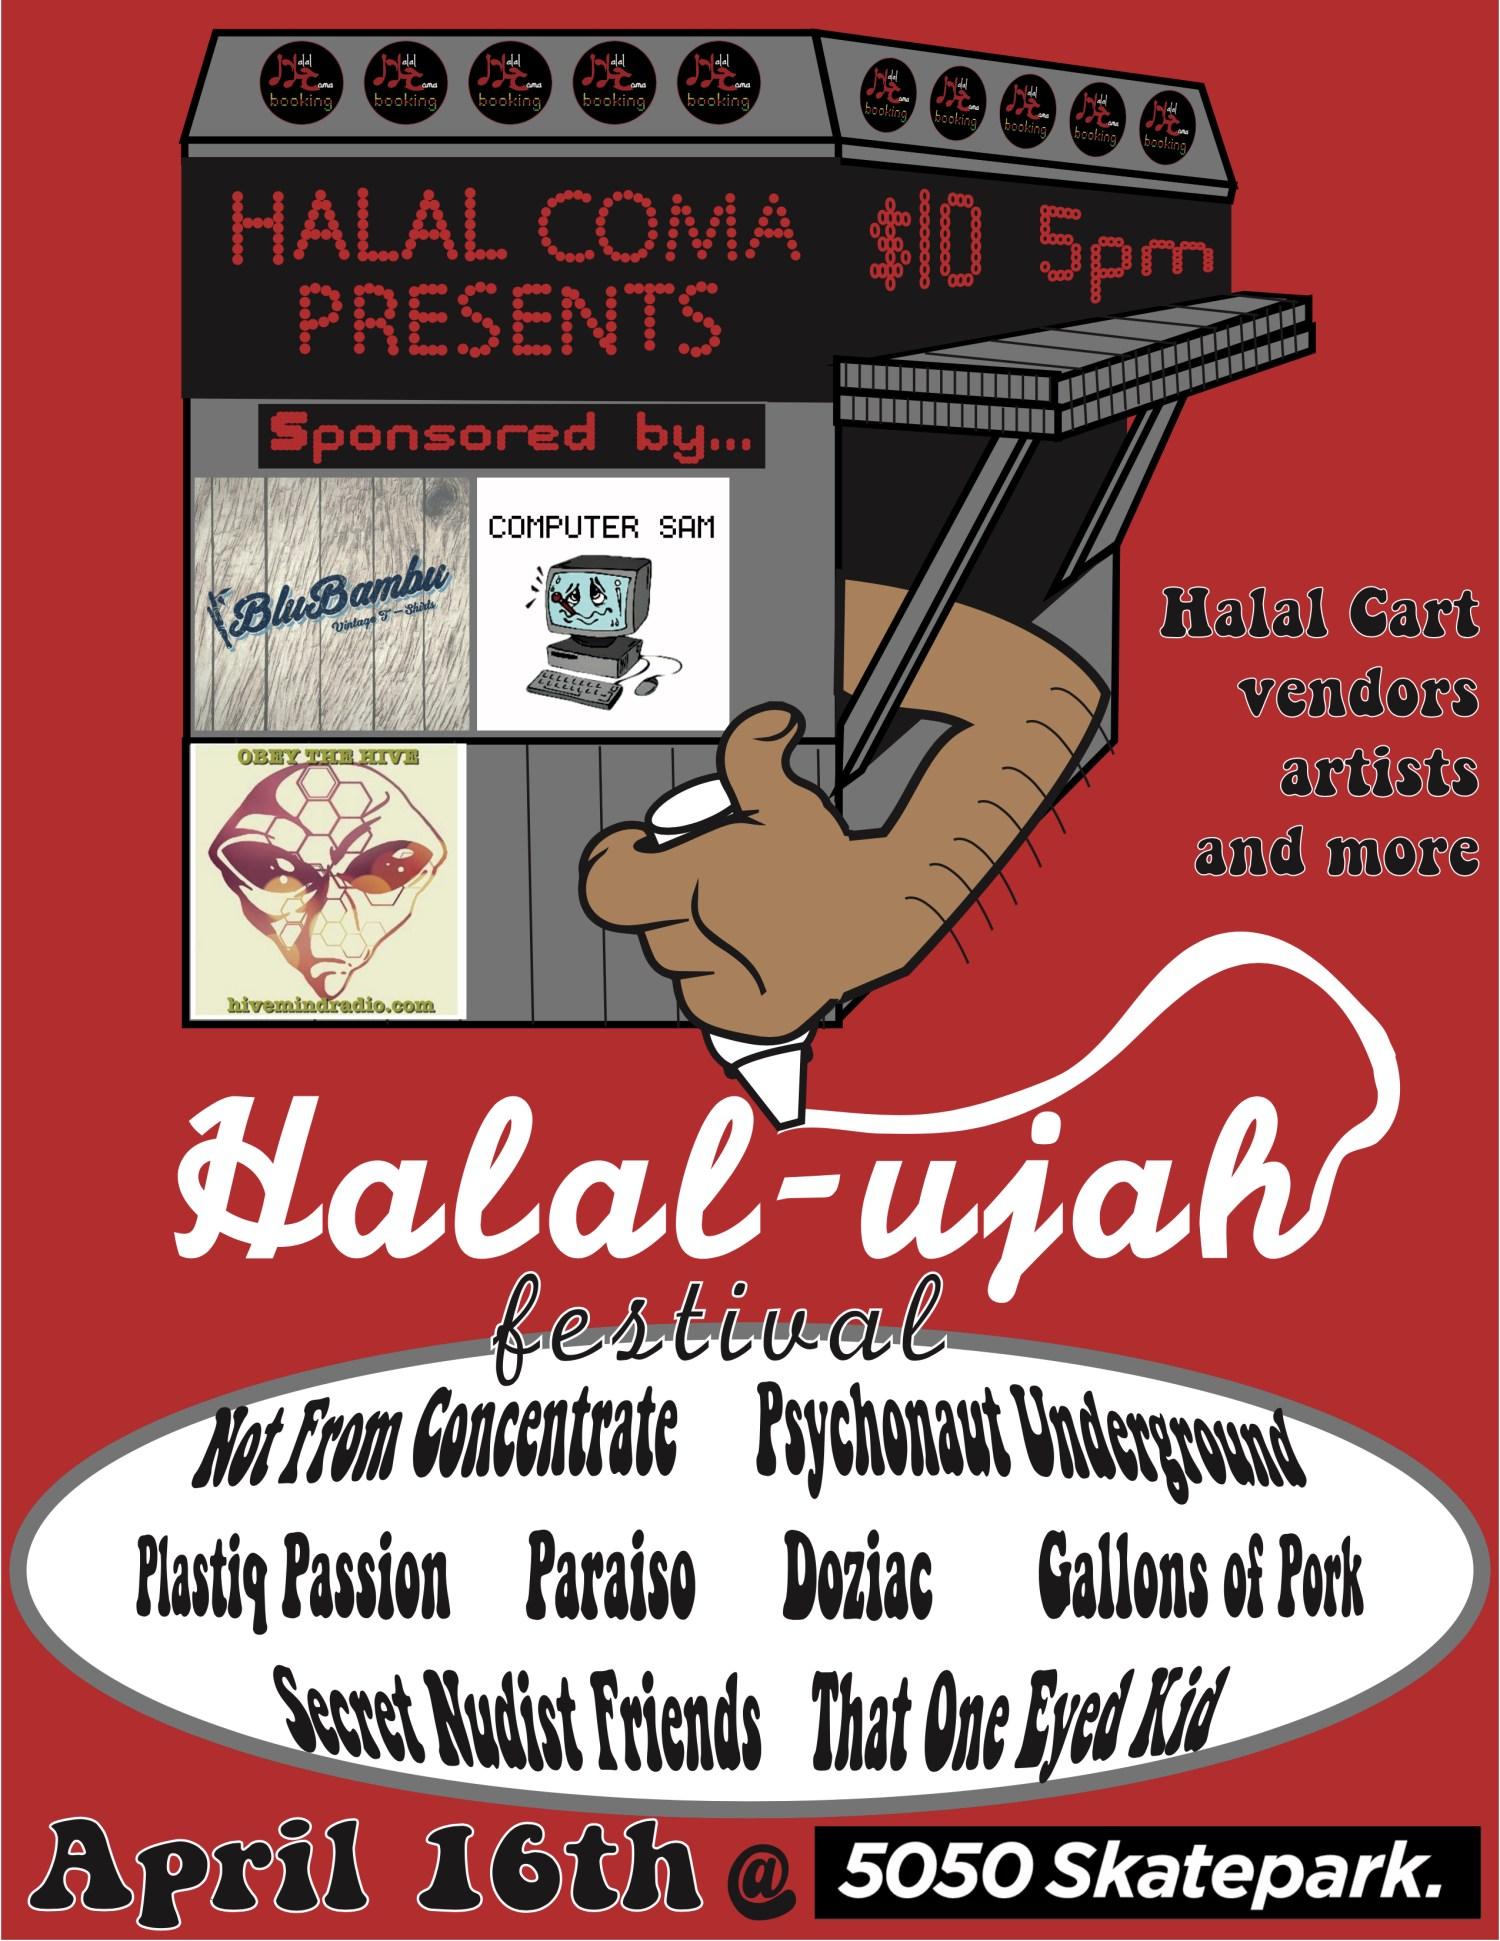 halal coma cart poster update 3.6